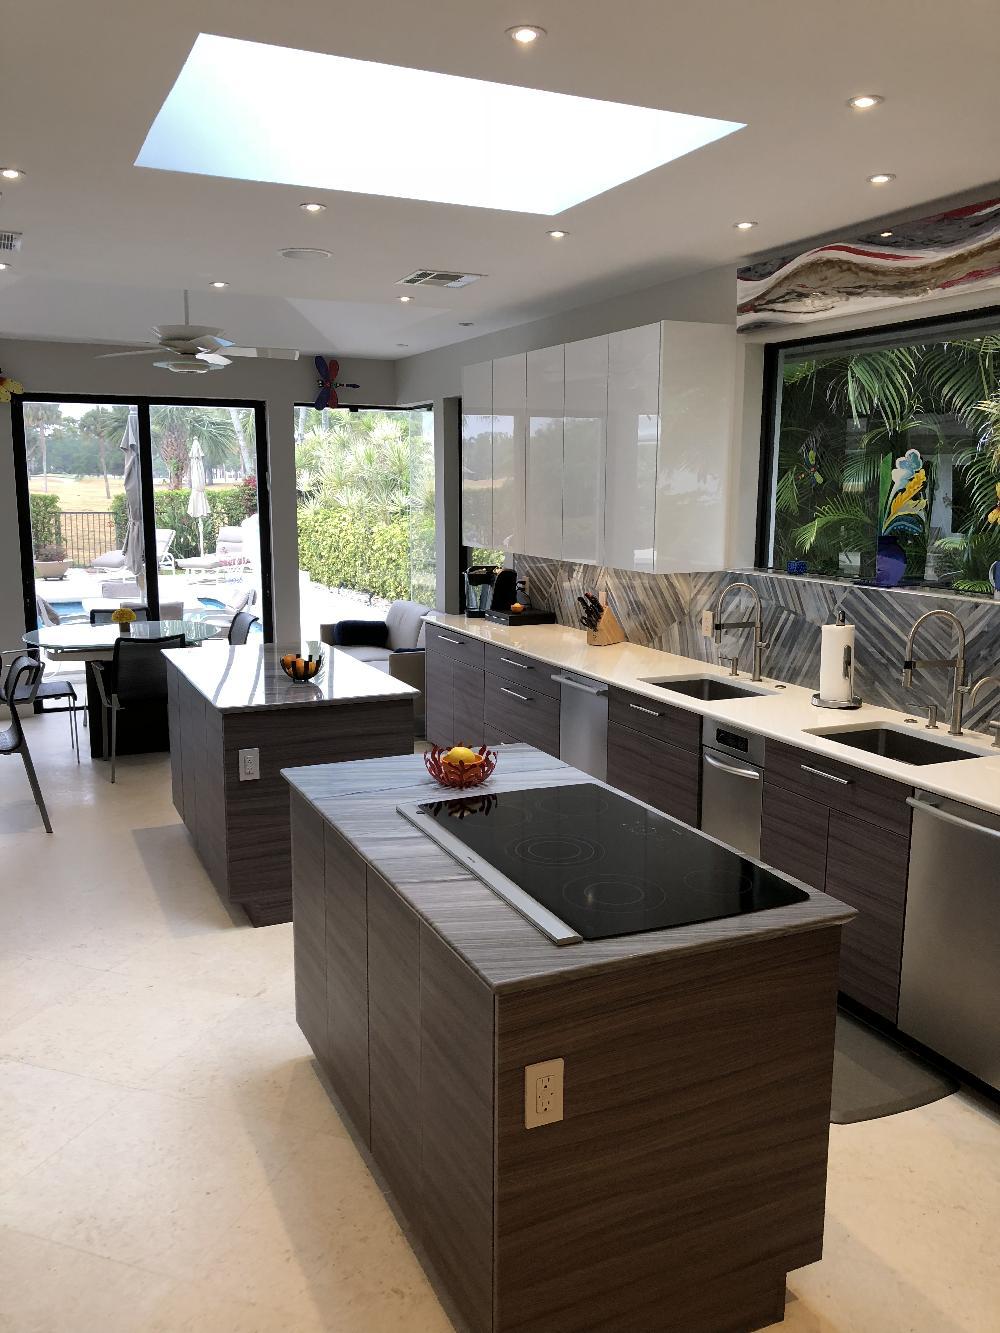 Modern Kitchen on Bocaire Blvd in Boca Raton, FL 33487 ...